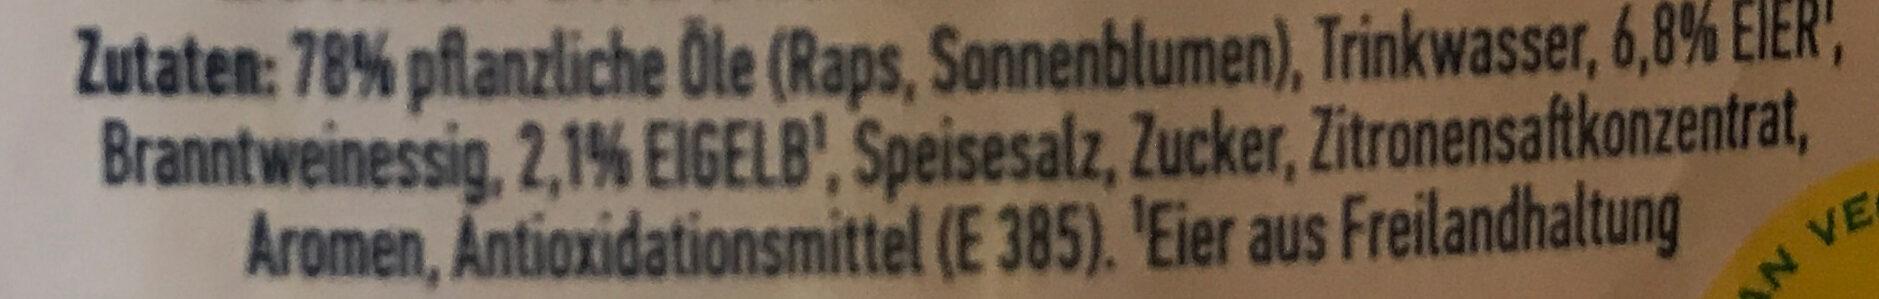 Real Mayonnaise - Ingrédients - de